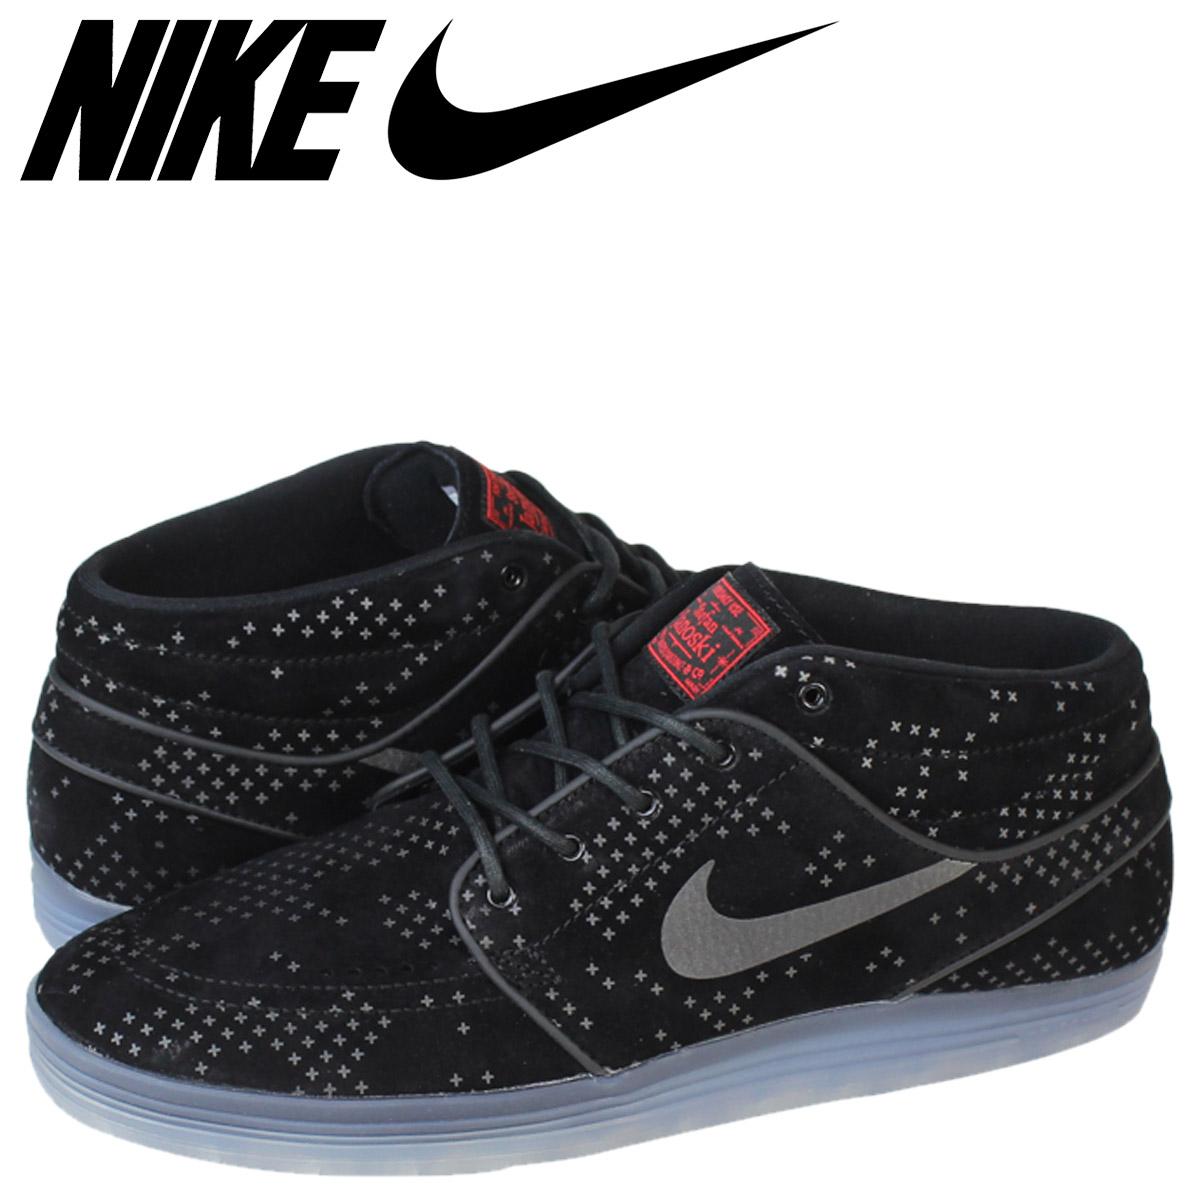 677d70095926 Whats up Sports  NIKE Nike Luna sneakers LUNAR STEFAN JANOSKI MID ...